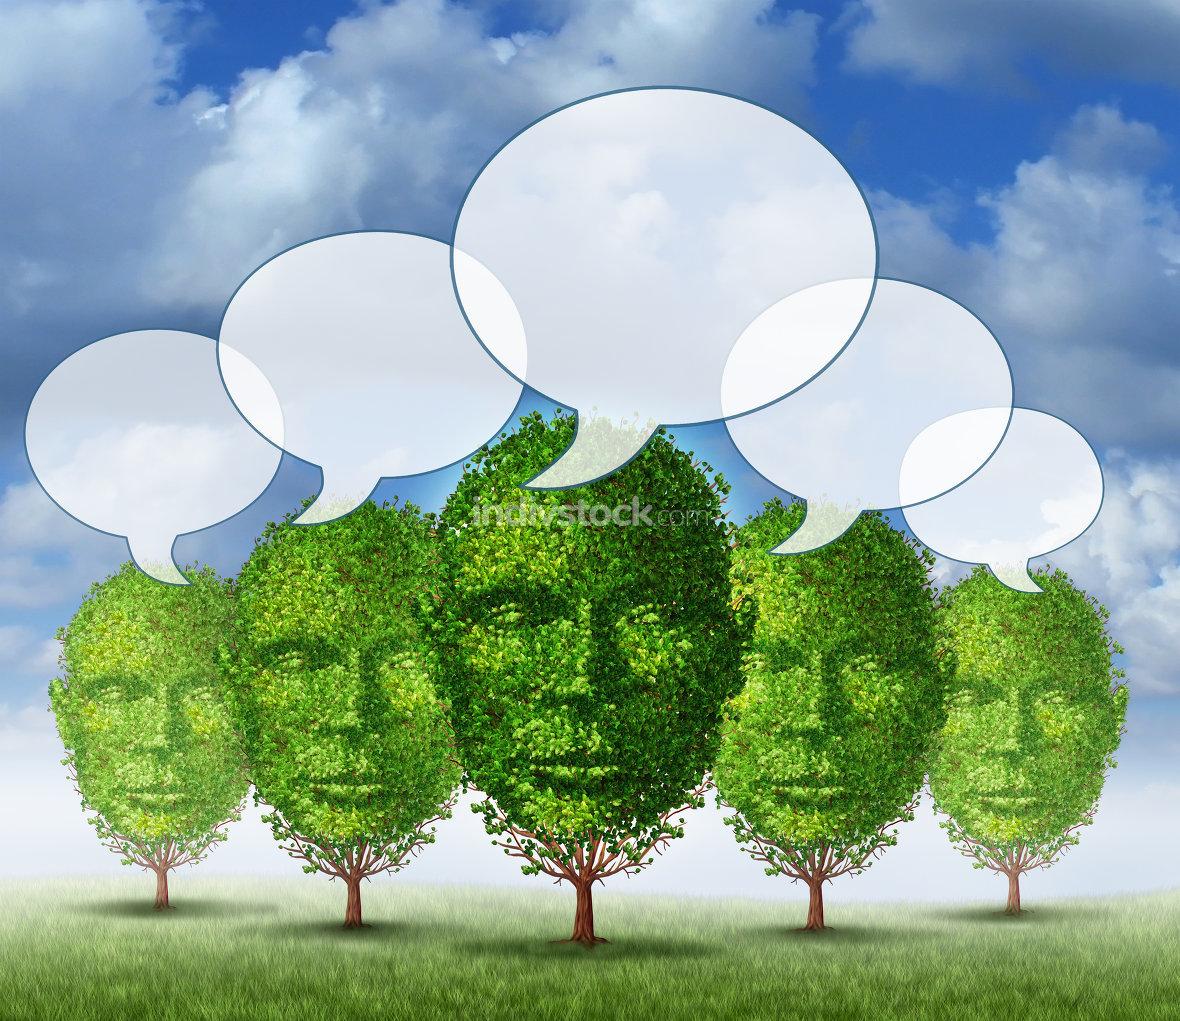 Growing Communication Community